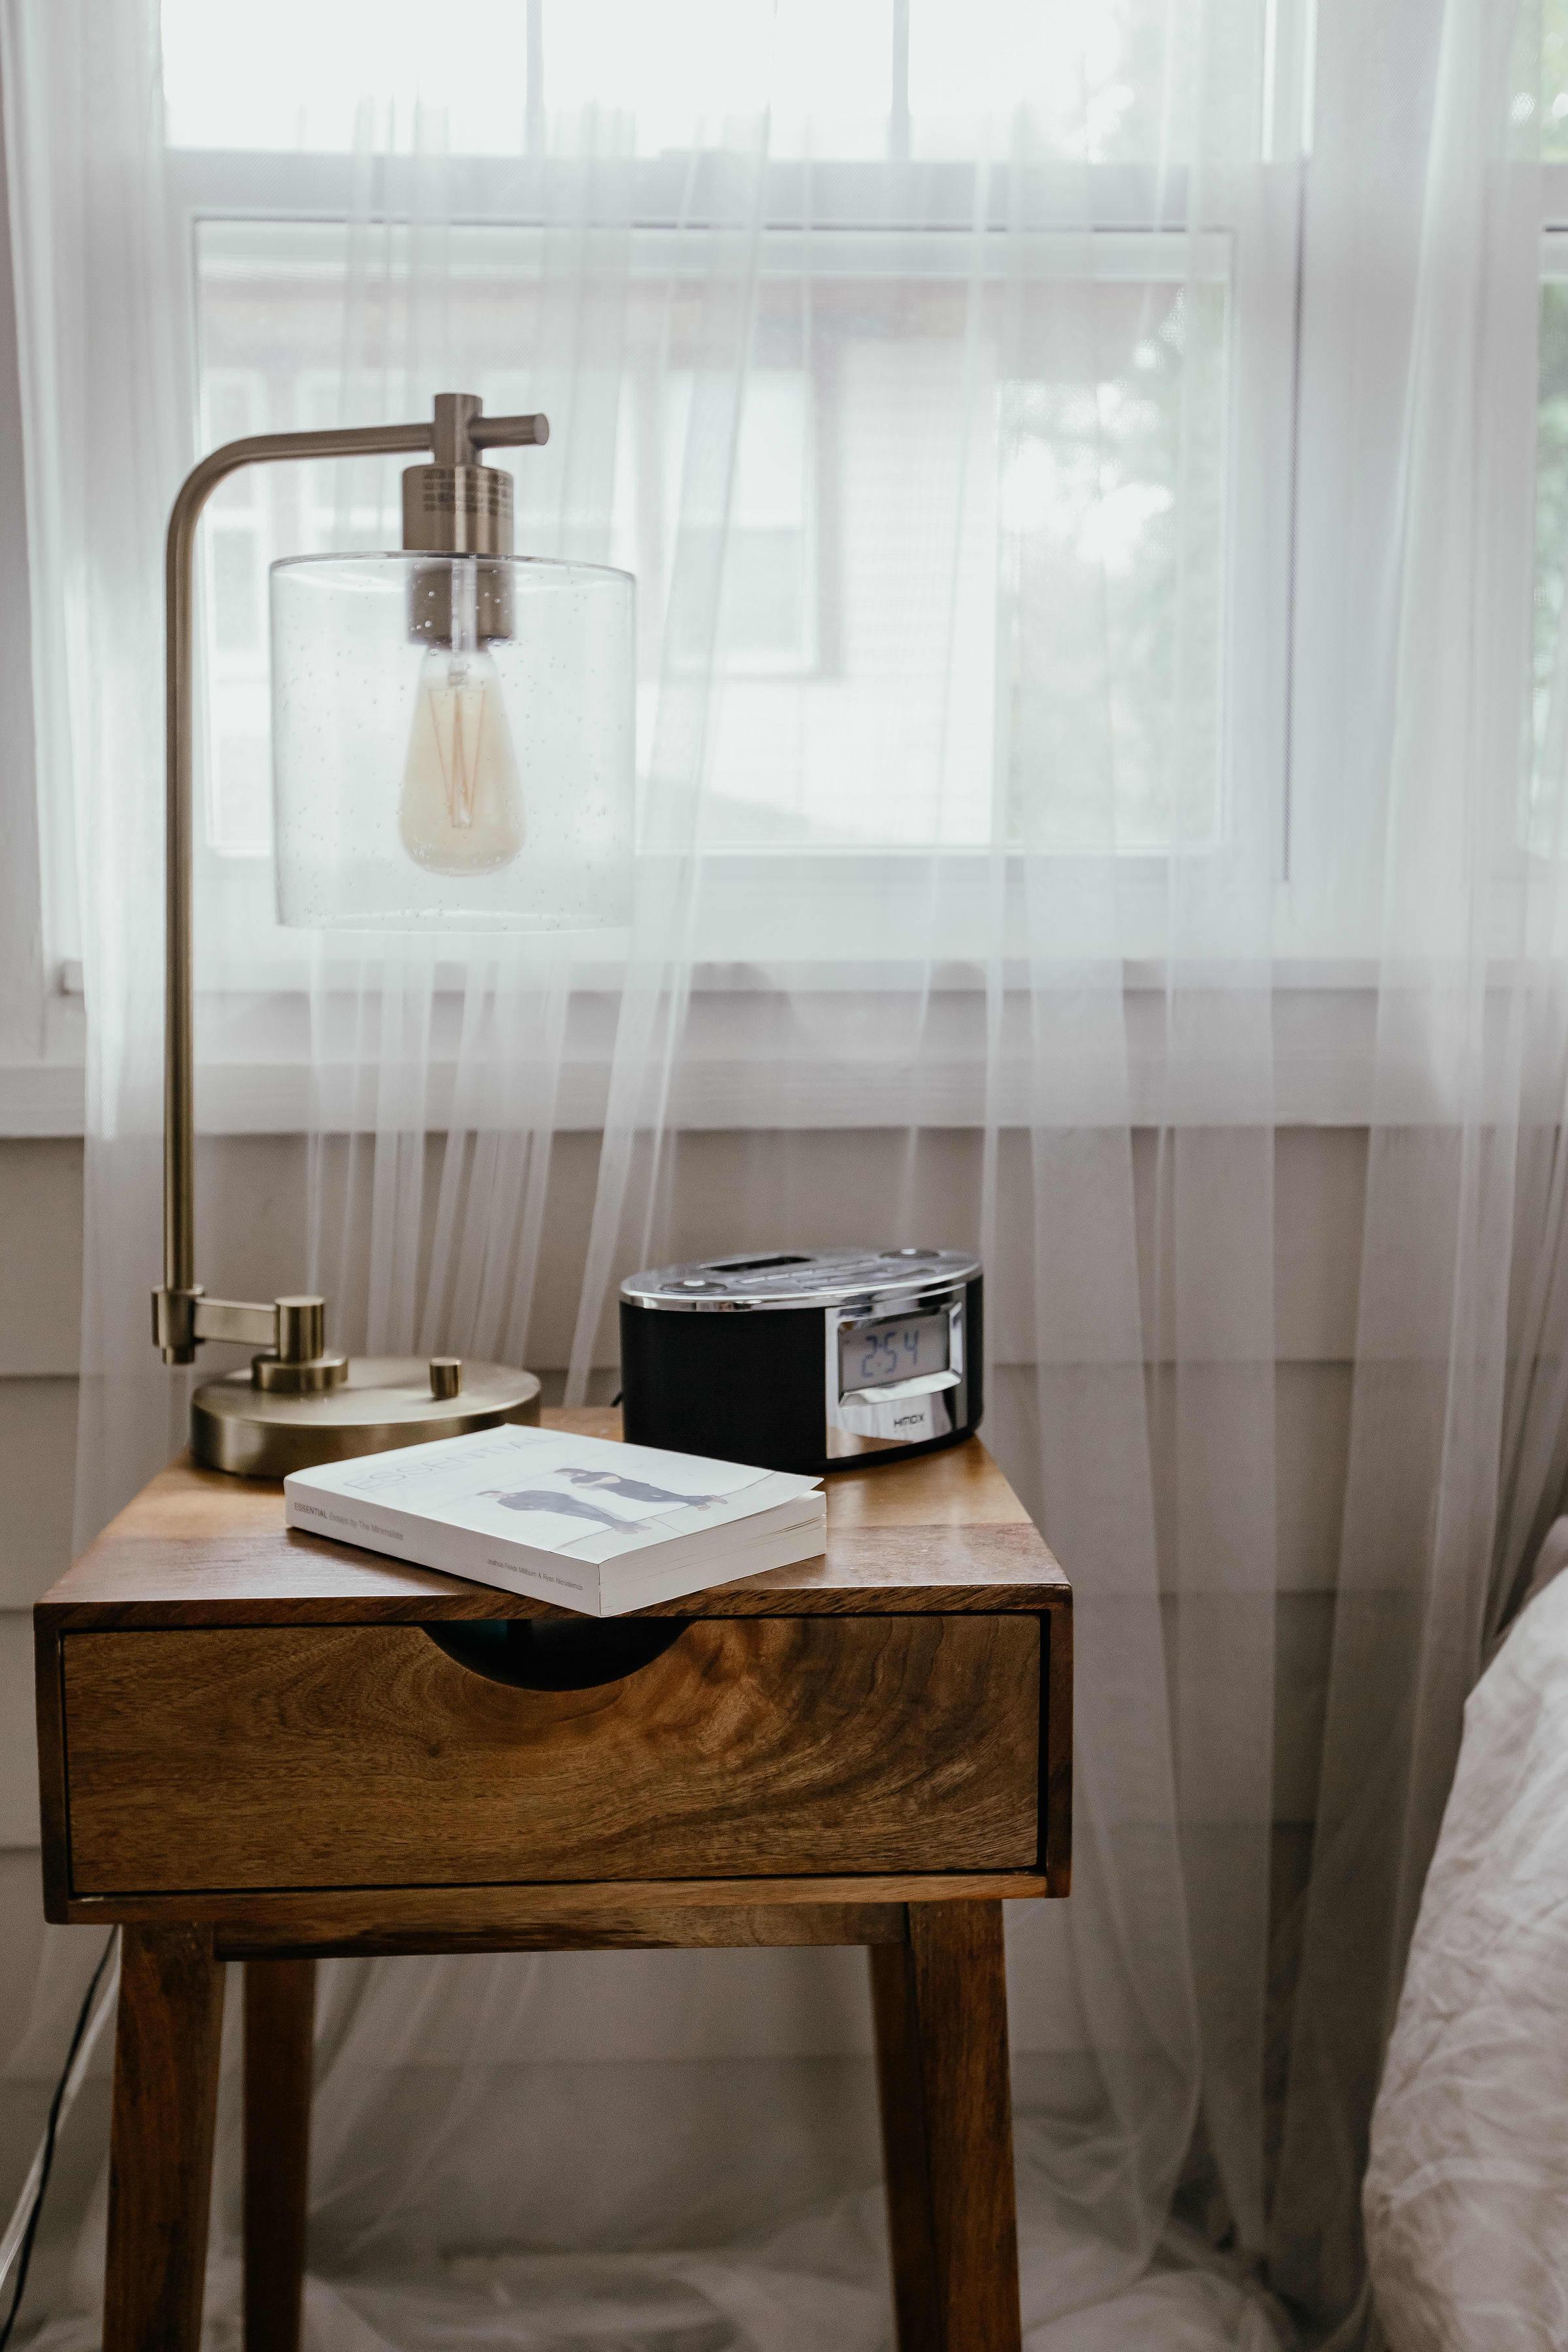 Small Space Decor Ideas In A Minimal Garage Apartment Apartment